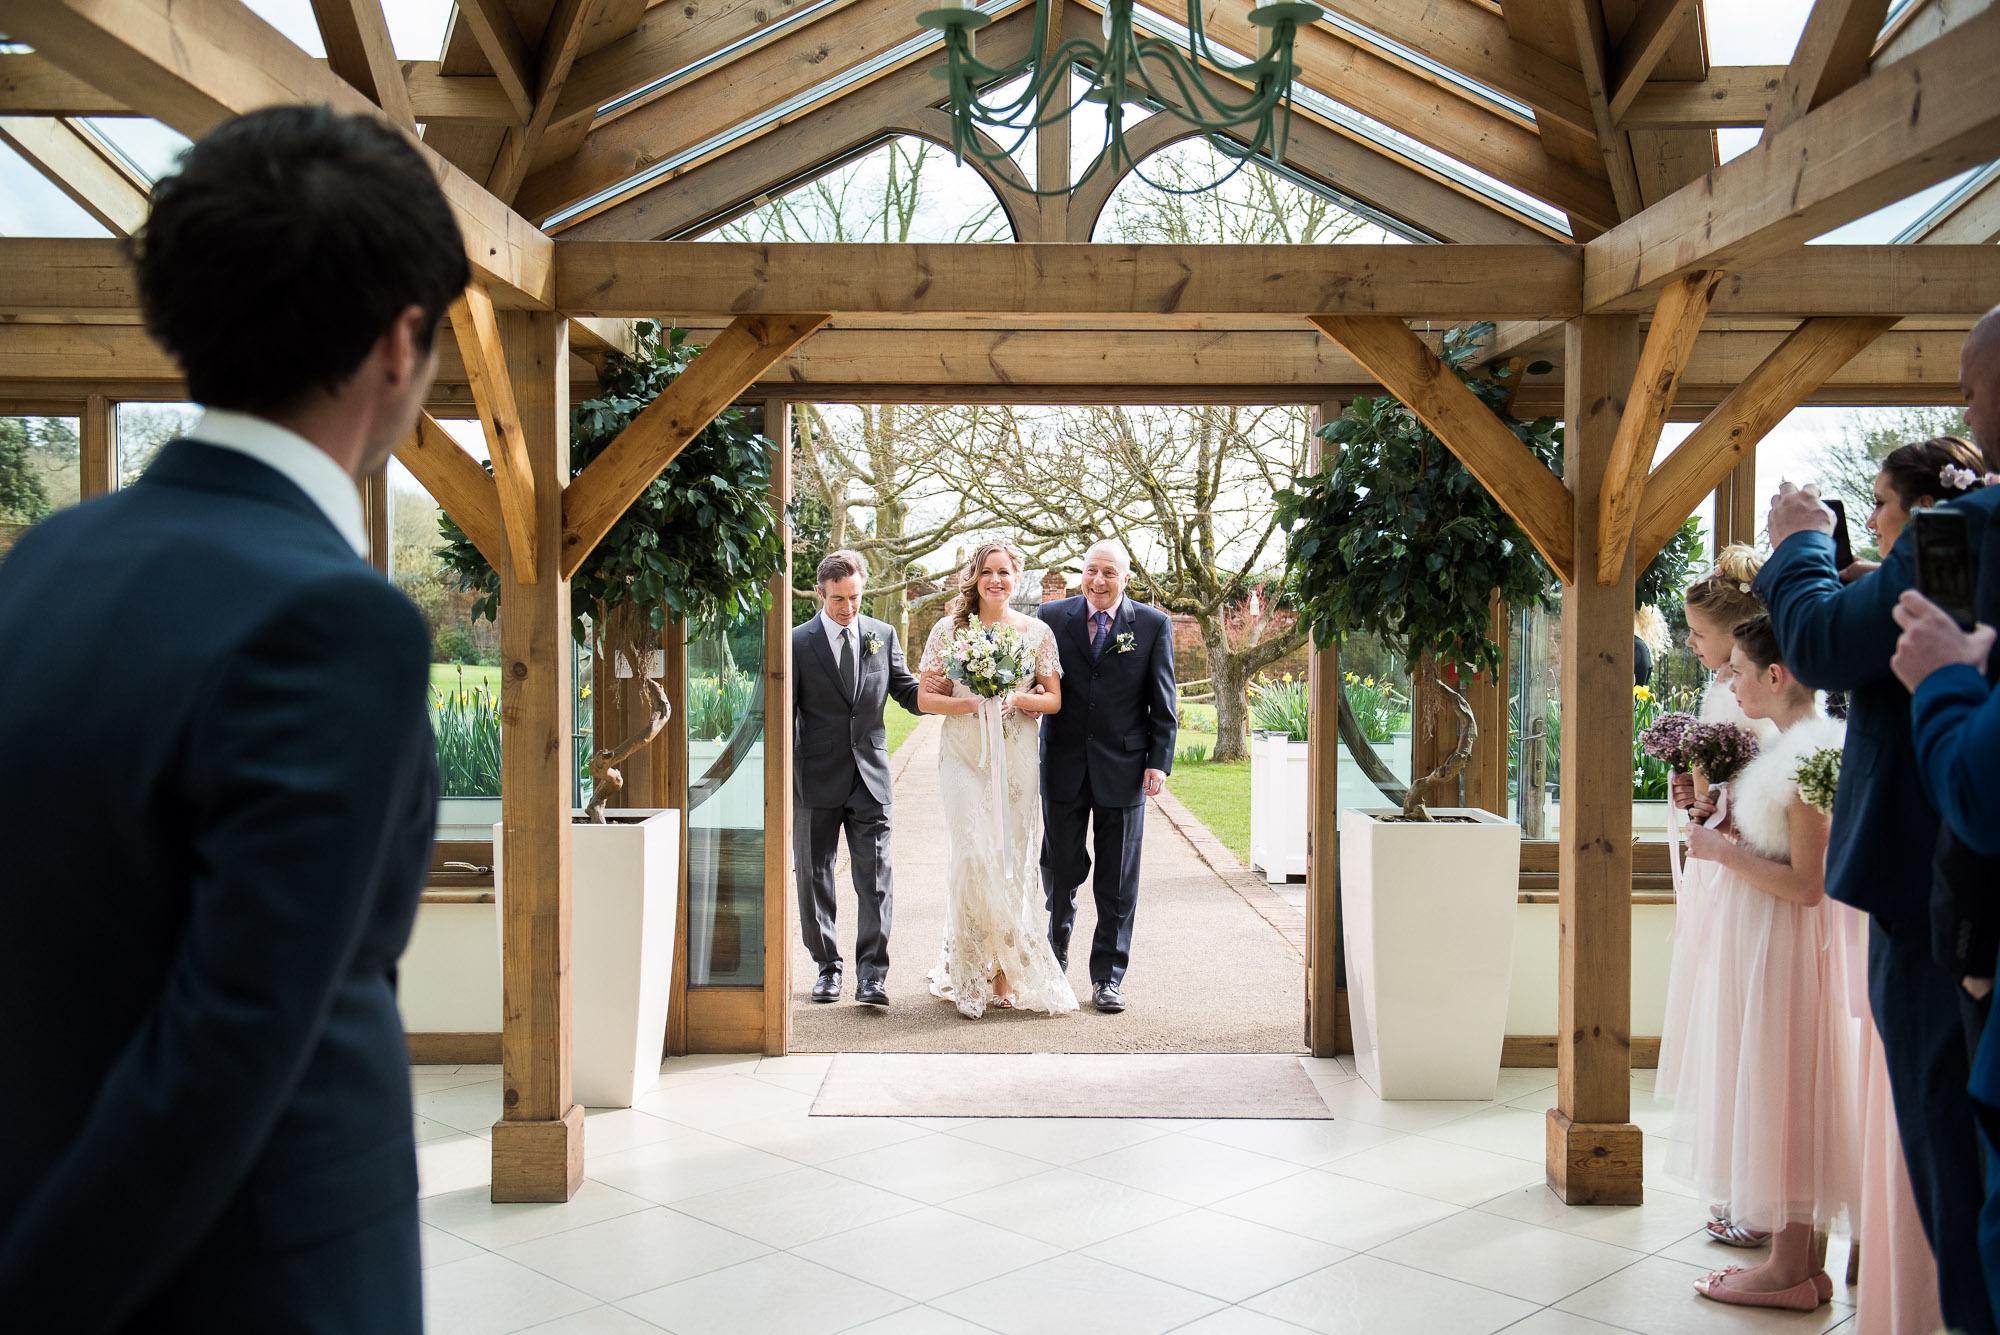 Alice Temperely bride arrives to meet her groom